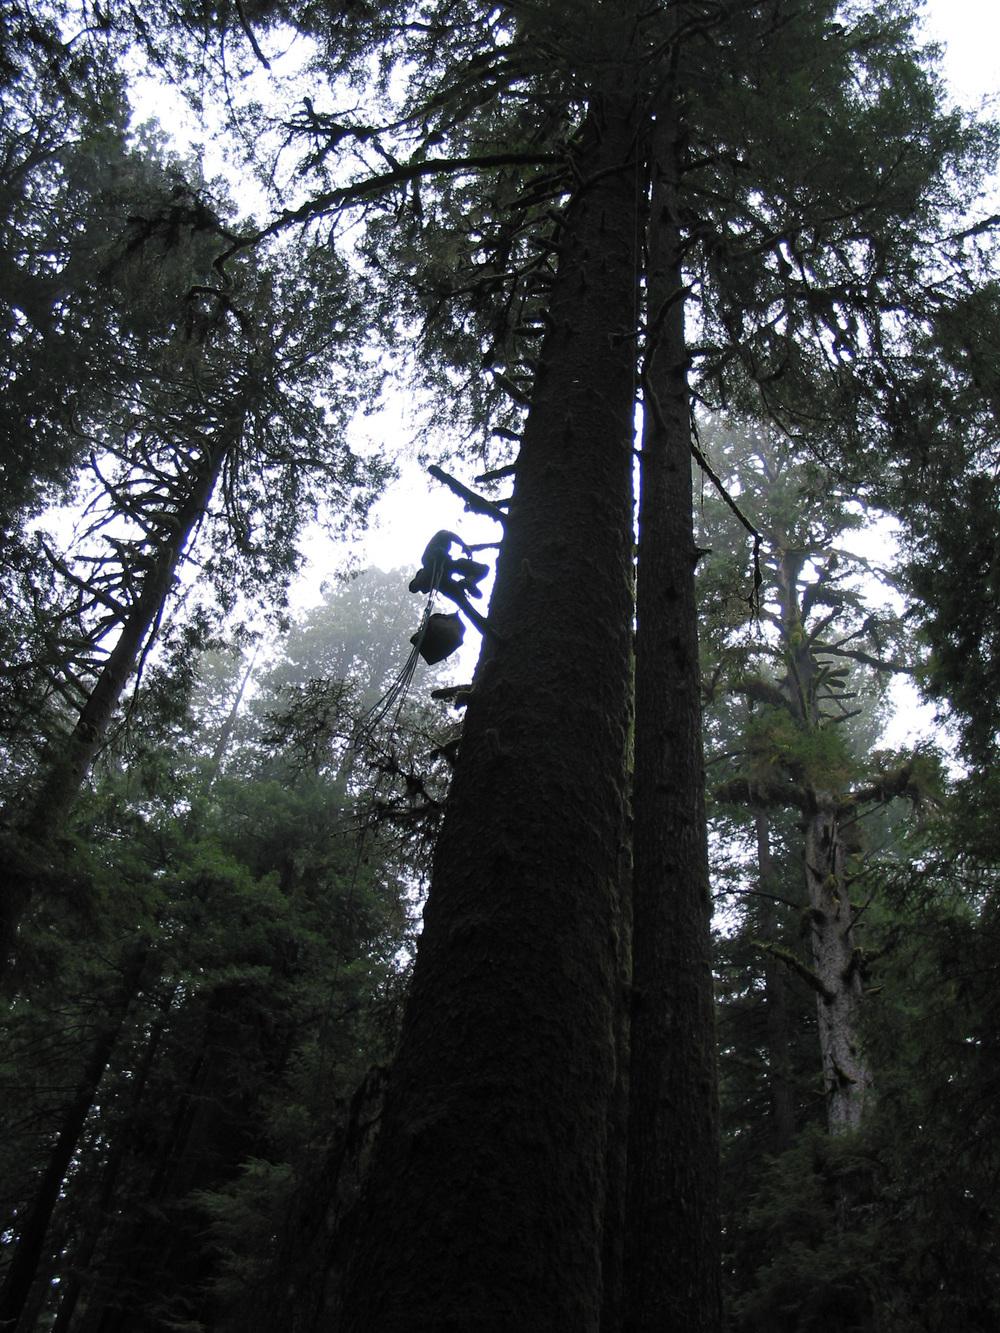 Ascending Sitka spruce – California